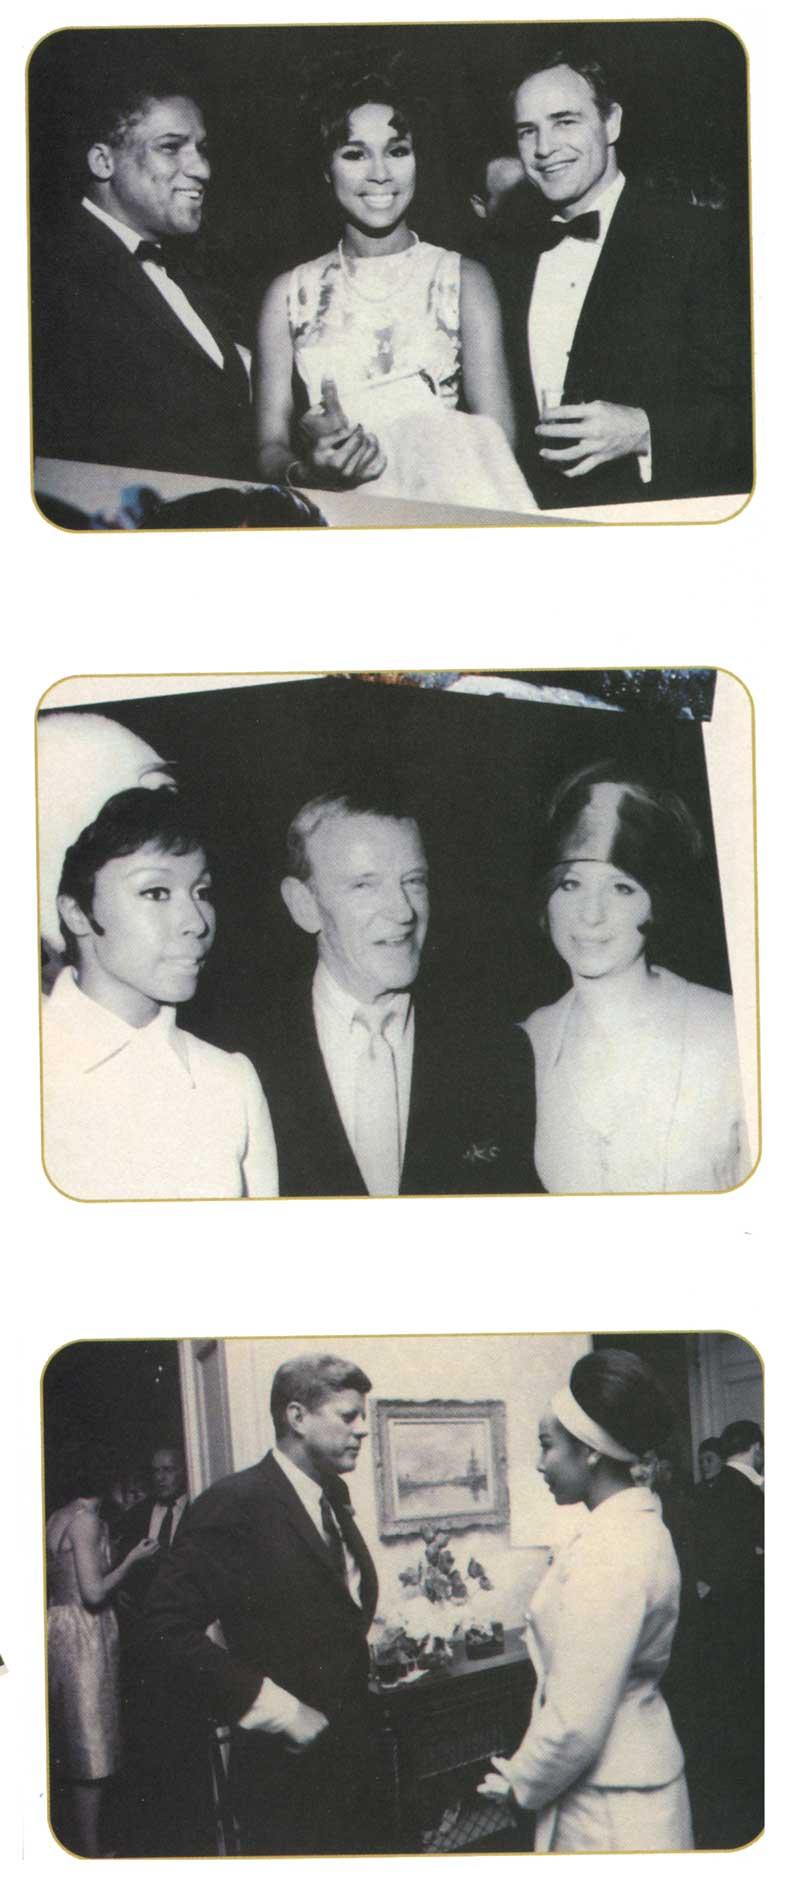 Diahann Carroll with Marlon Brando, Fred Astaire, Barbra Streisand, President John F. Kennedy